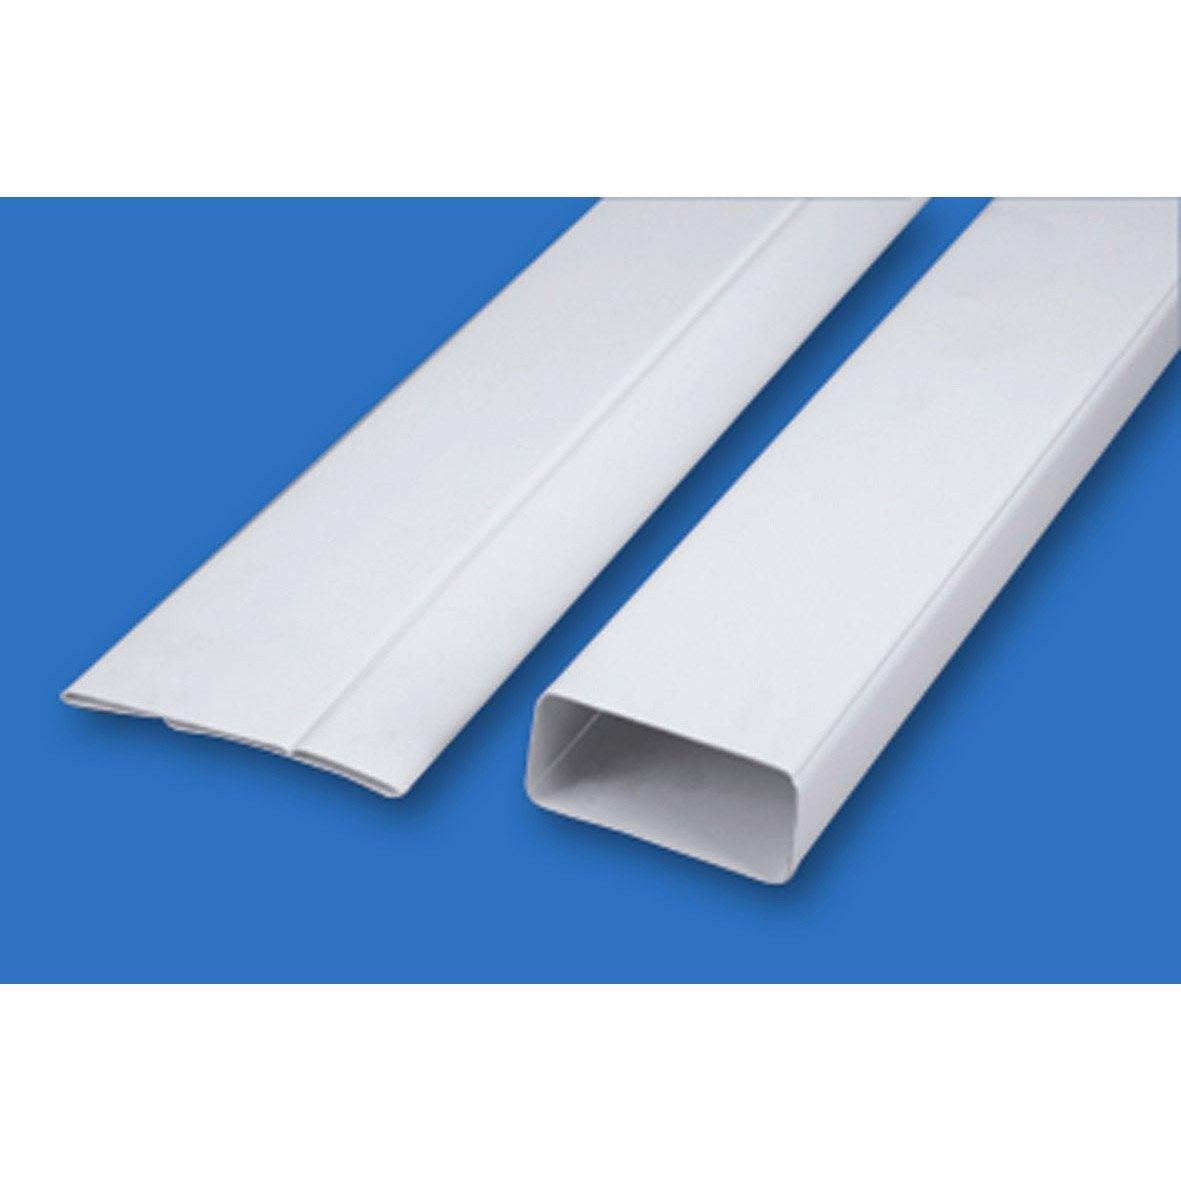 Tube rectangulaire rigide plat pvc s p 100 mm 100 mm 1 - Friso pvc leroy merlin ...